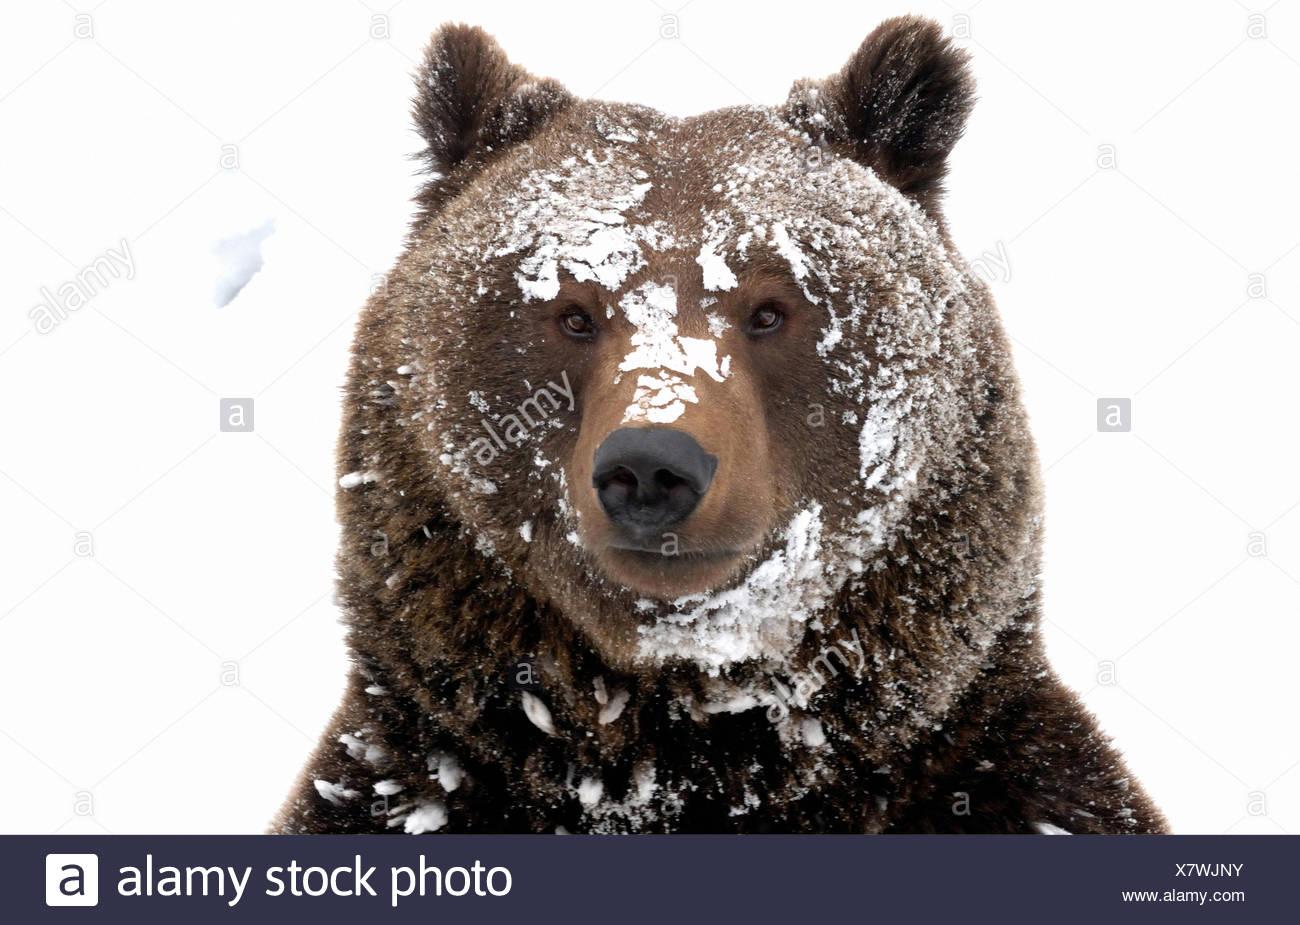 Brown bear European bear European brown bear predator Ursus arctos bear Ursus winter snow winter bear Sneaking animal animals, - Stock Image